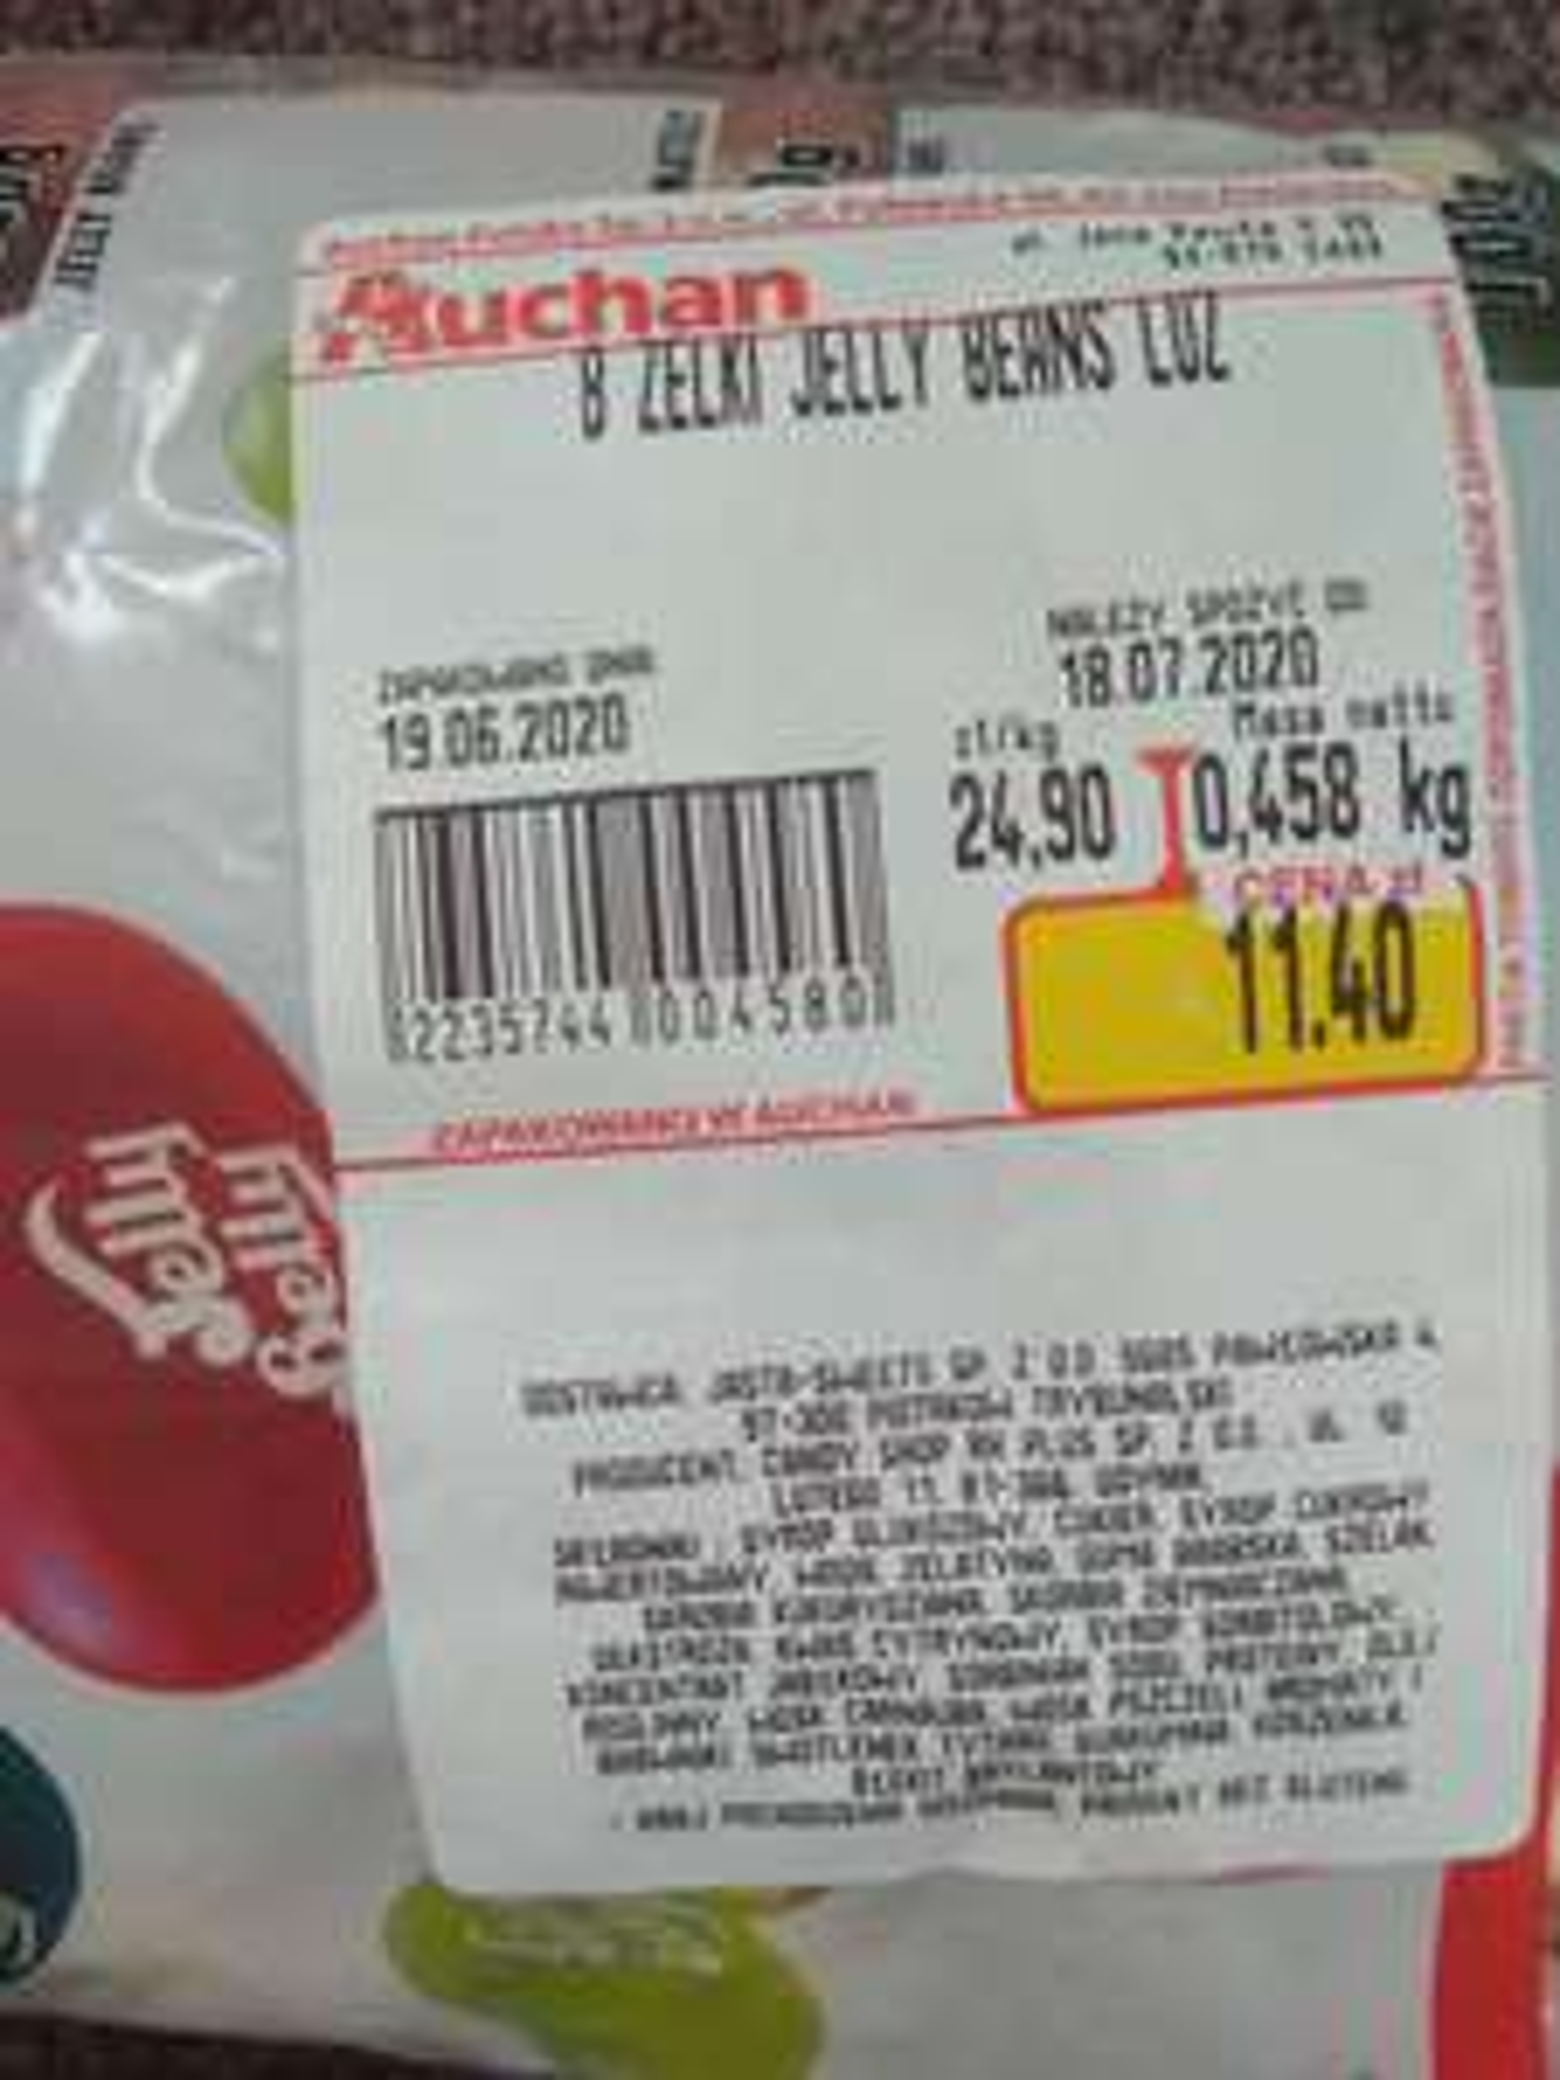 Auchan Fasolki Jelly Belly